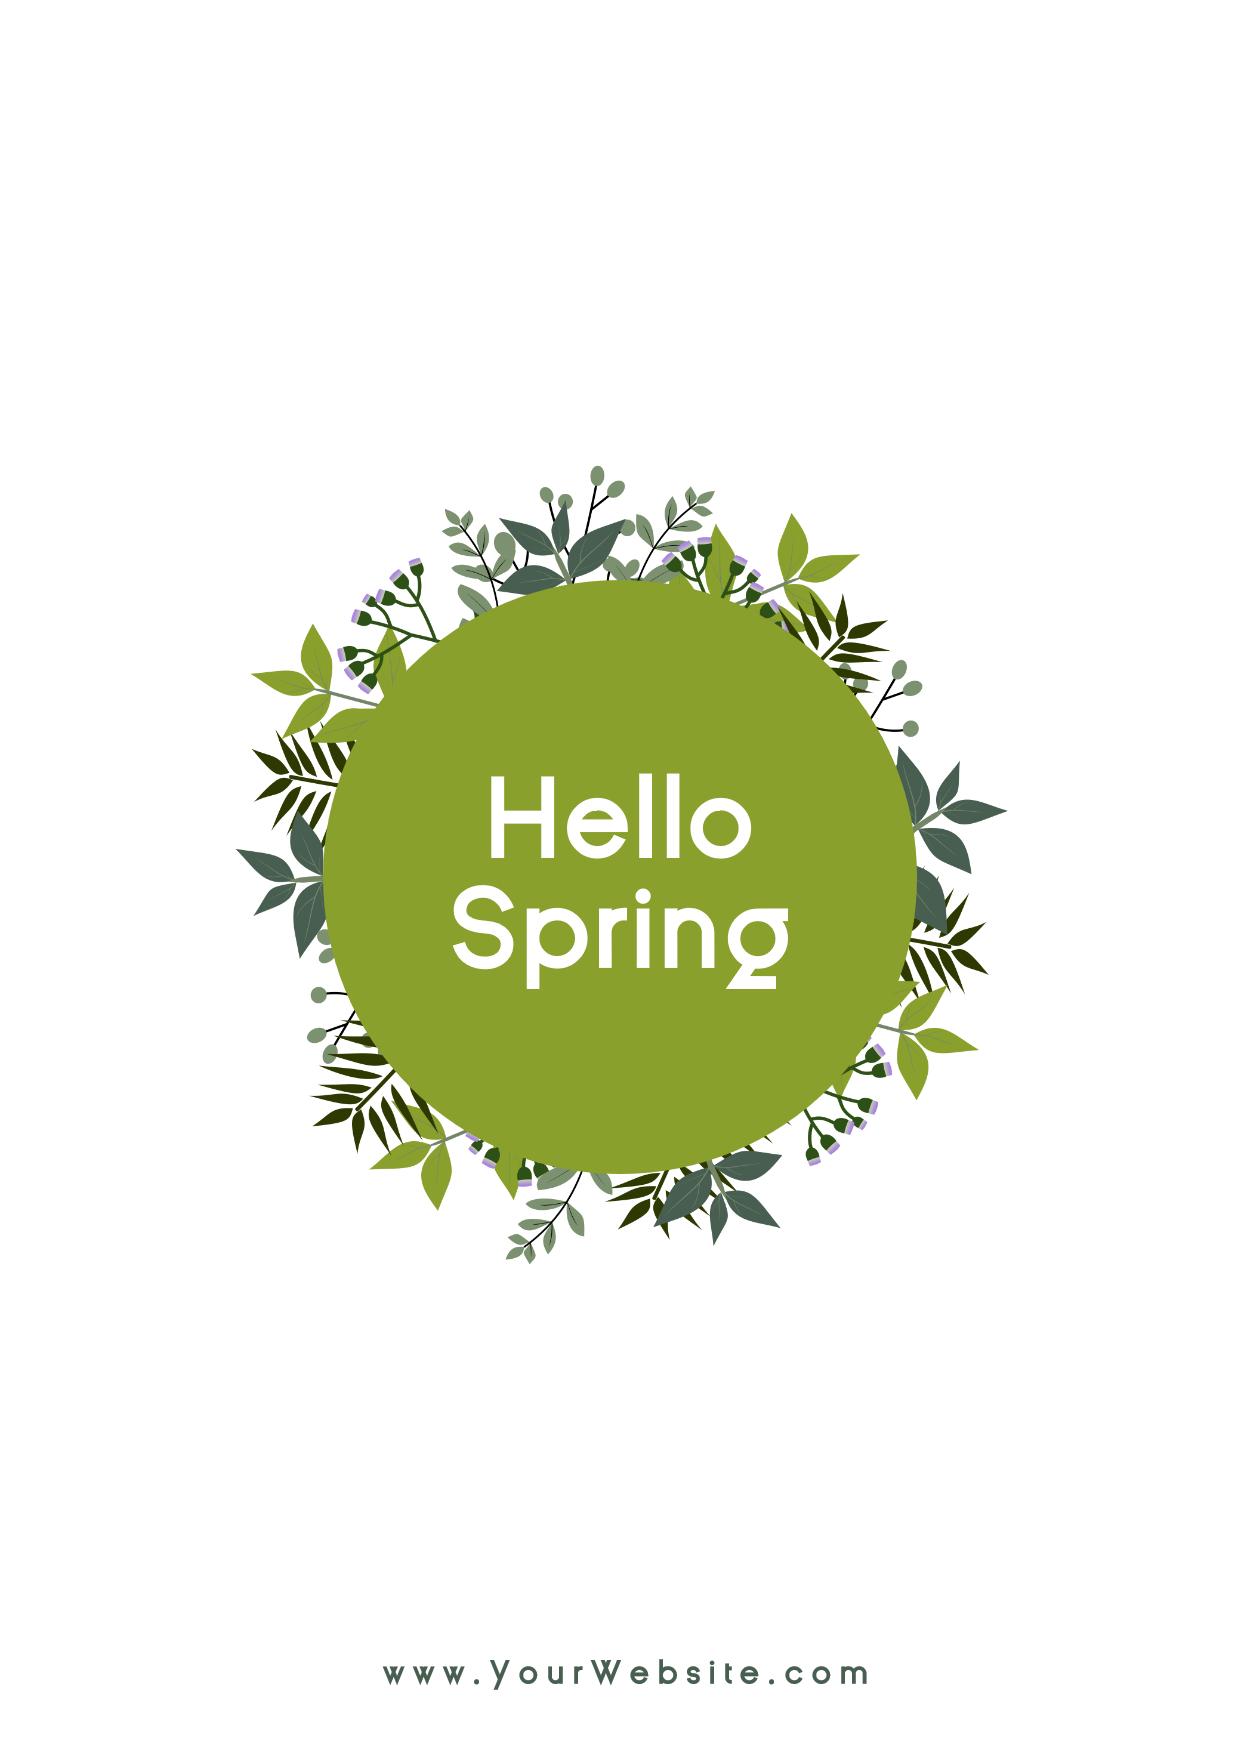 Hello spring social media post - Design  Template